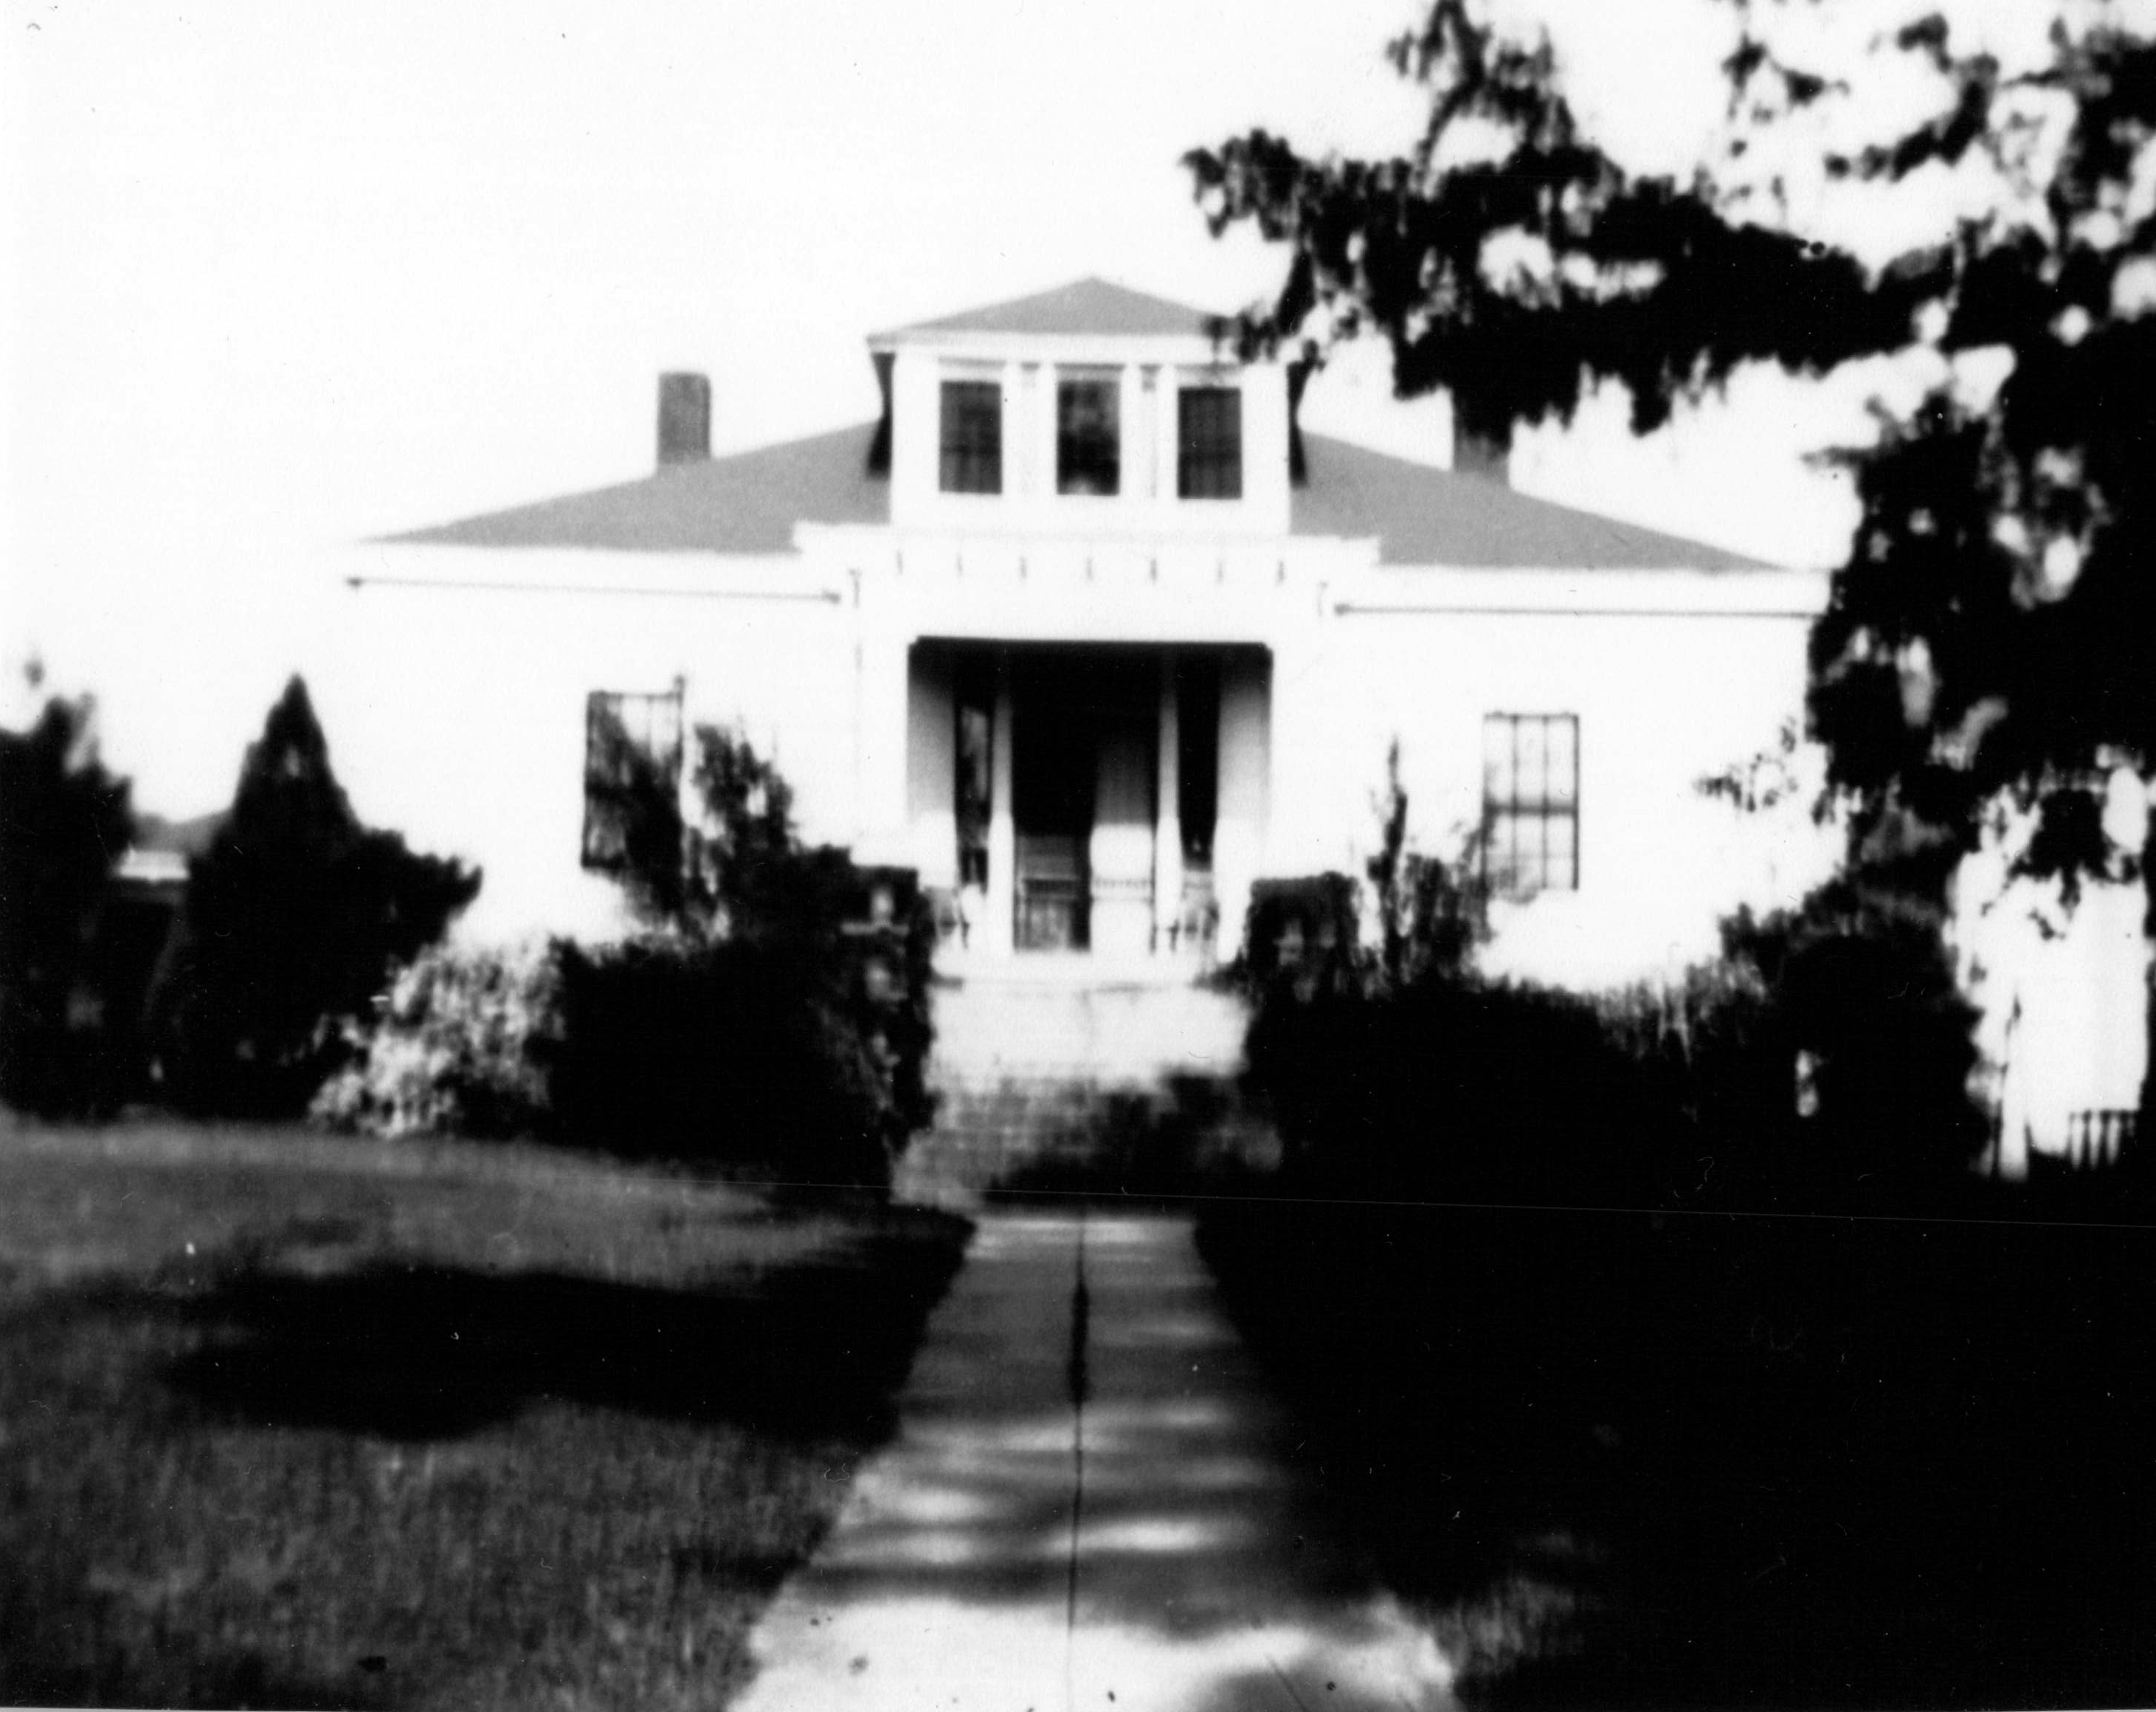 Pebble Hill circa 1930